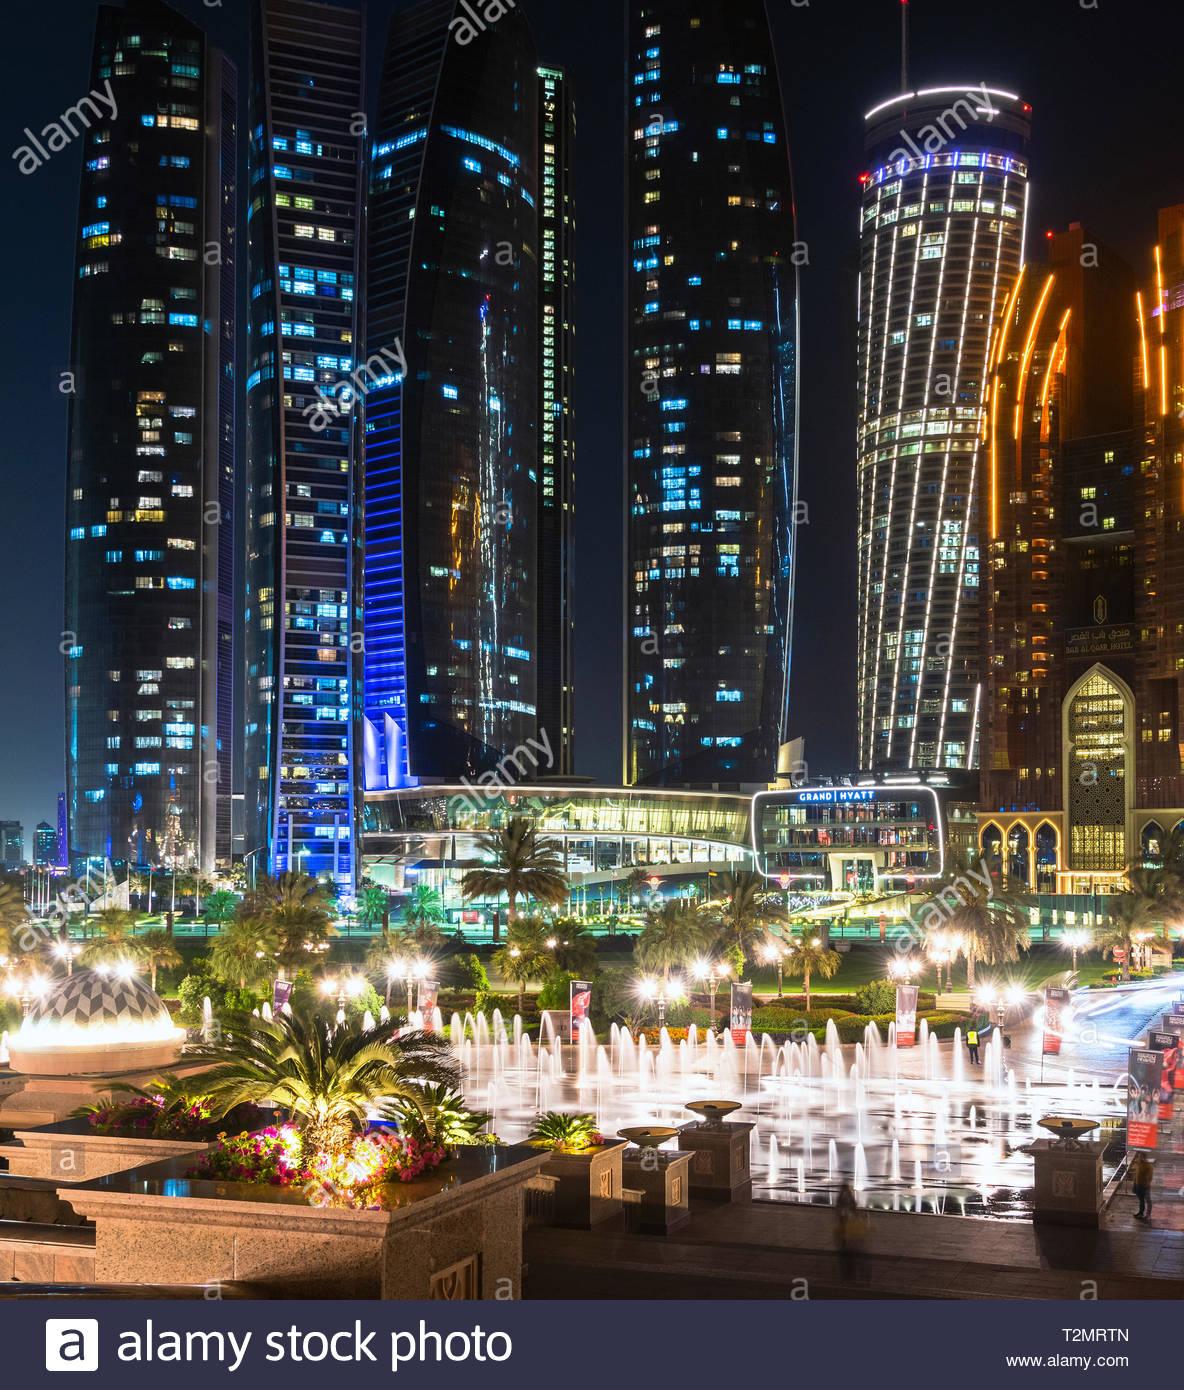 Abu Dhabi UAE   March 30 2019 Emirates Palace Fountain on 1184x1390